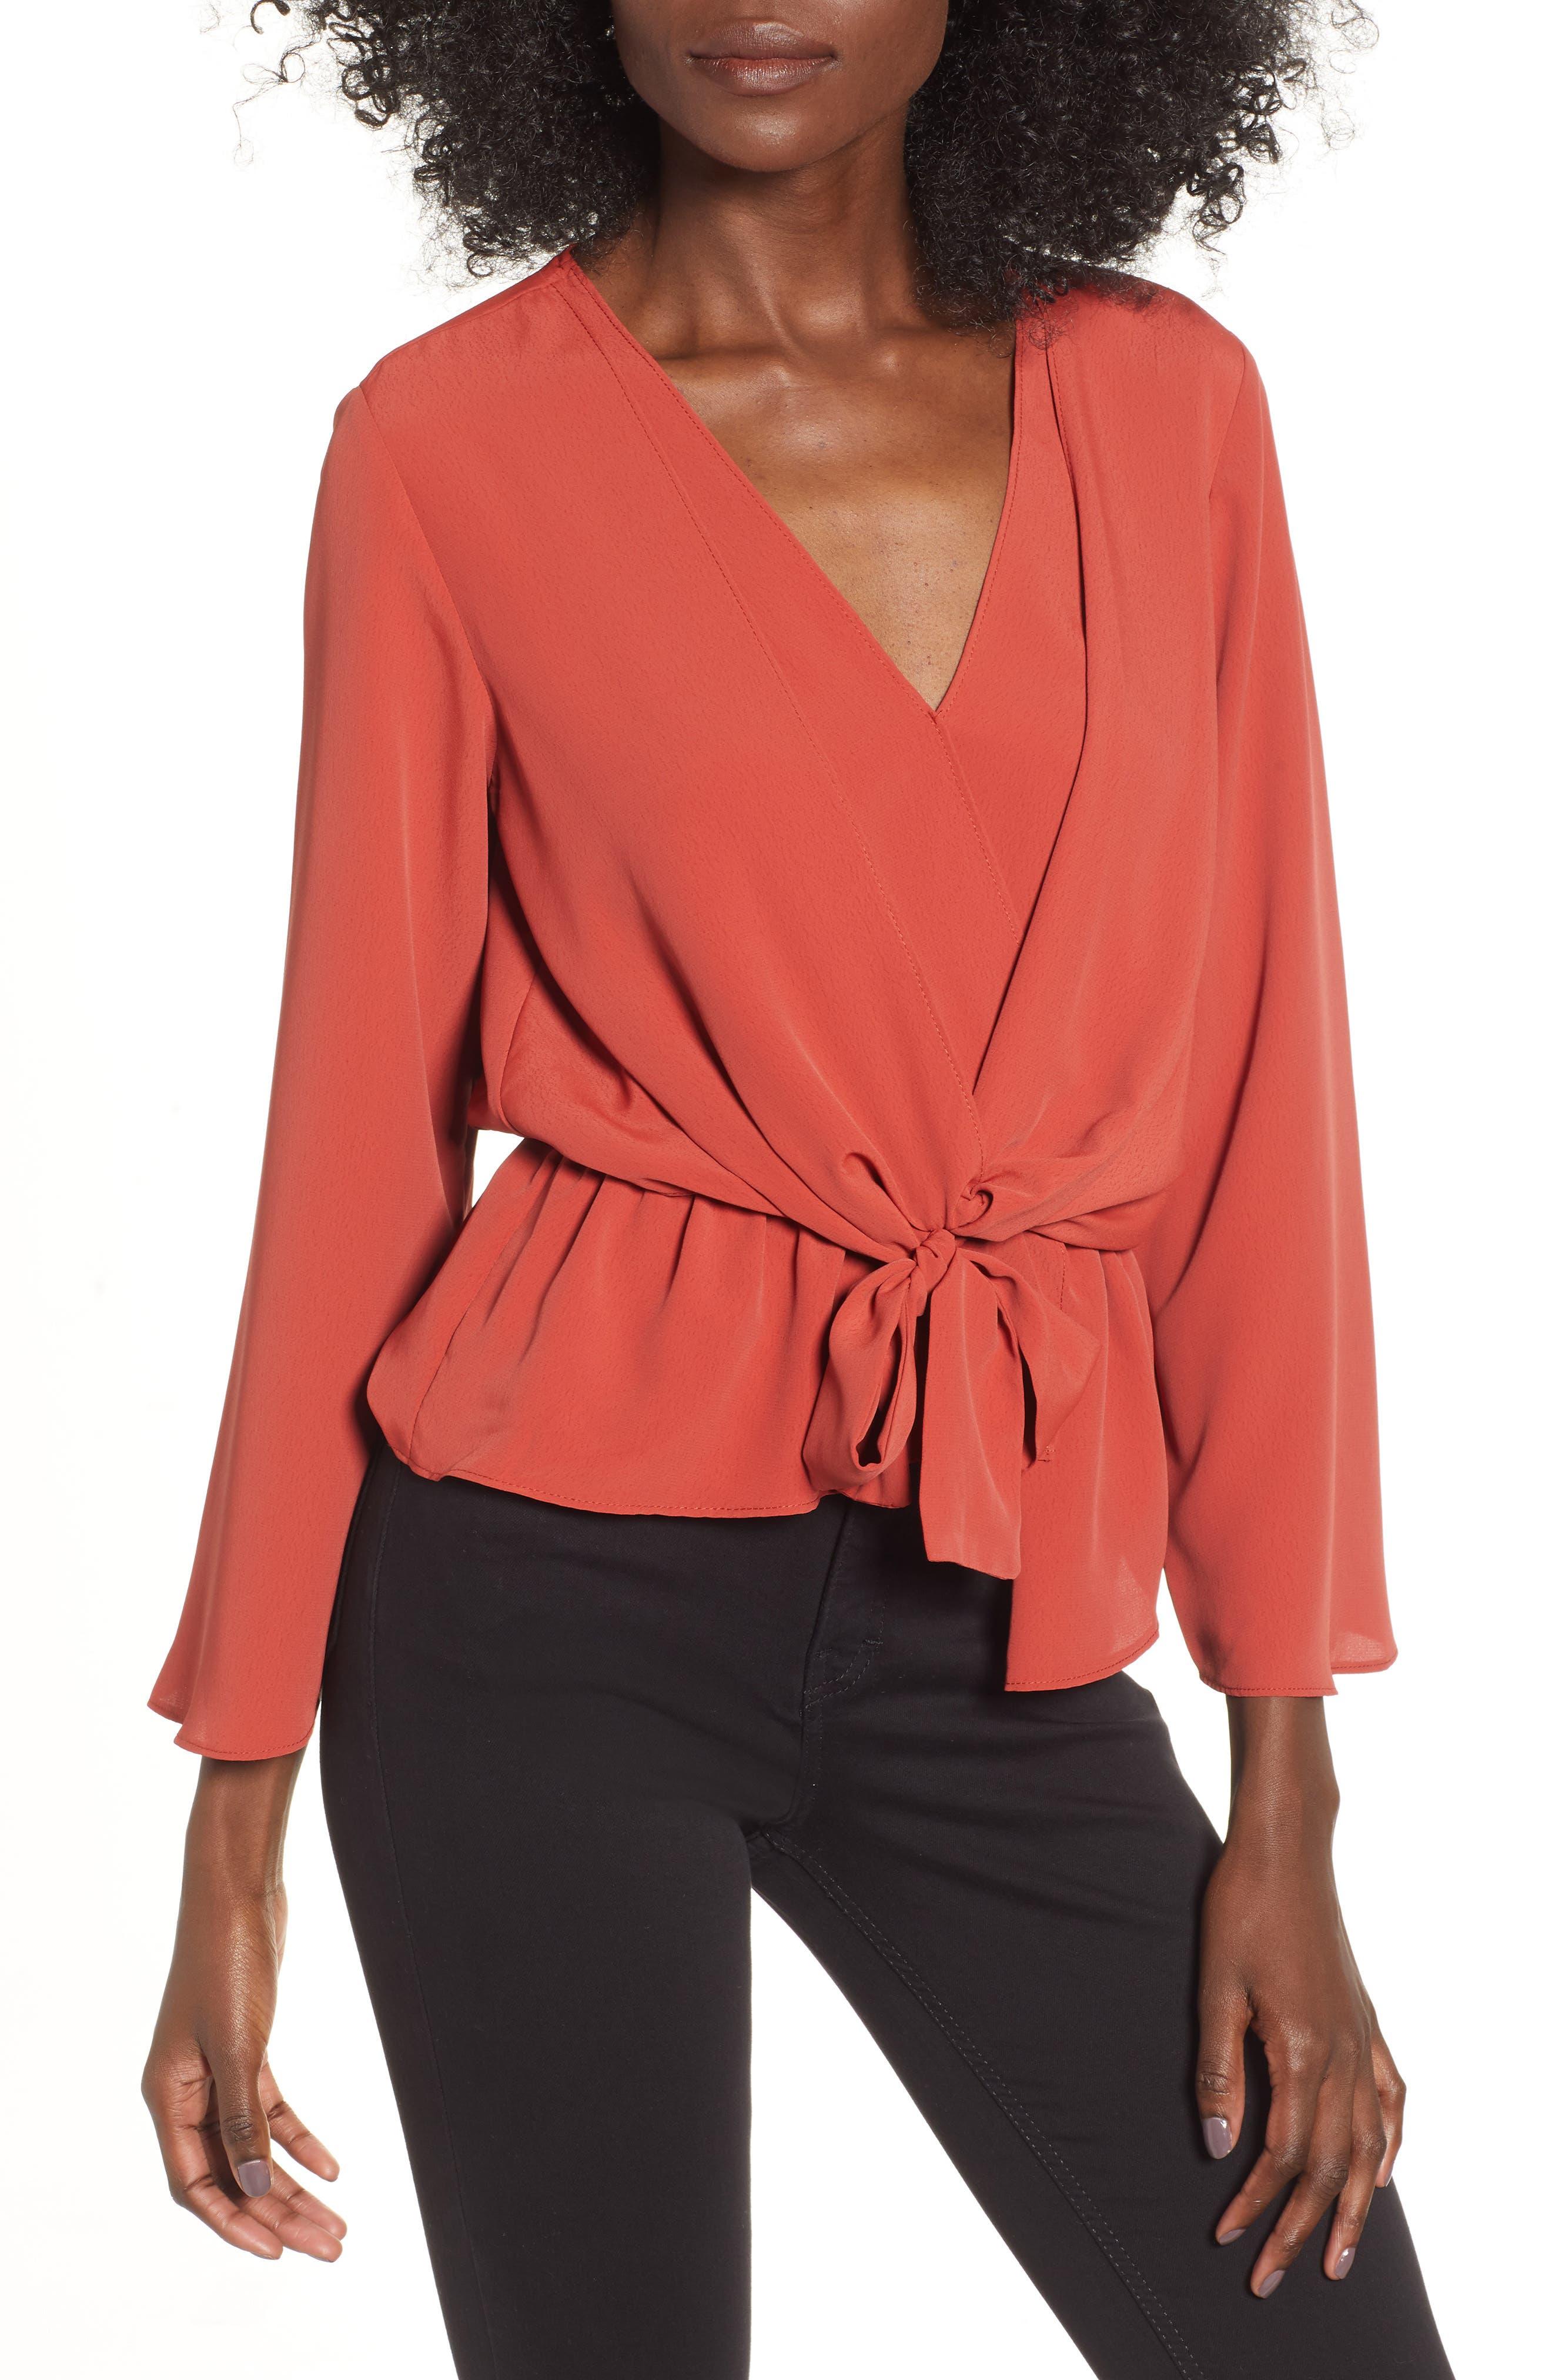 Tiffany Asymmetrical Blouse,                             Main thumbnail 1, color,                             220